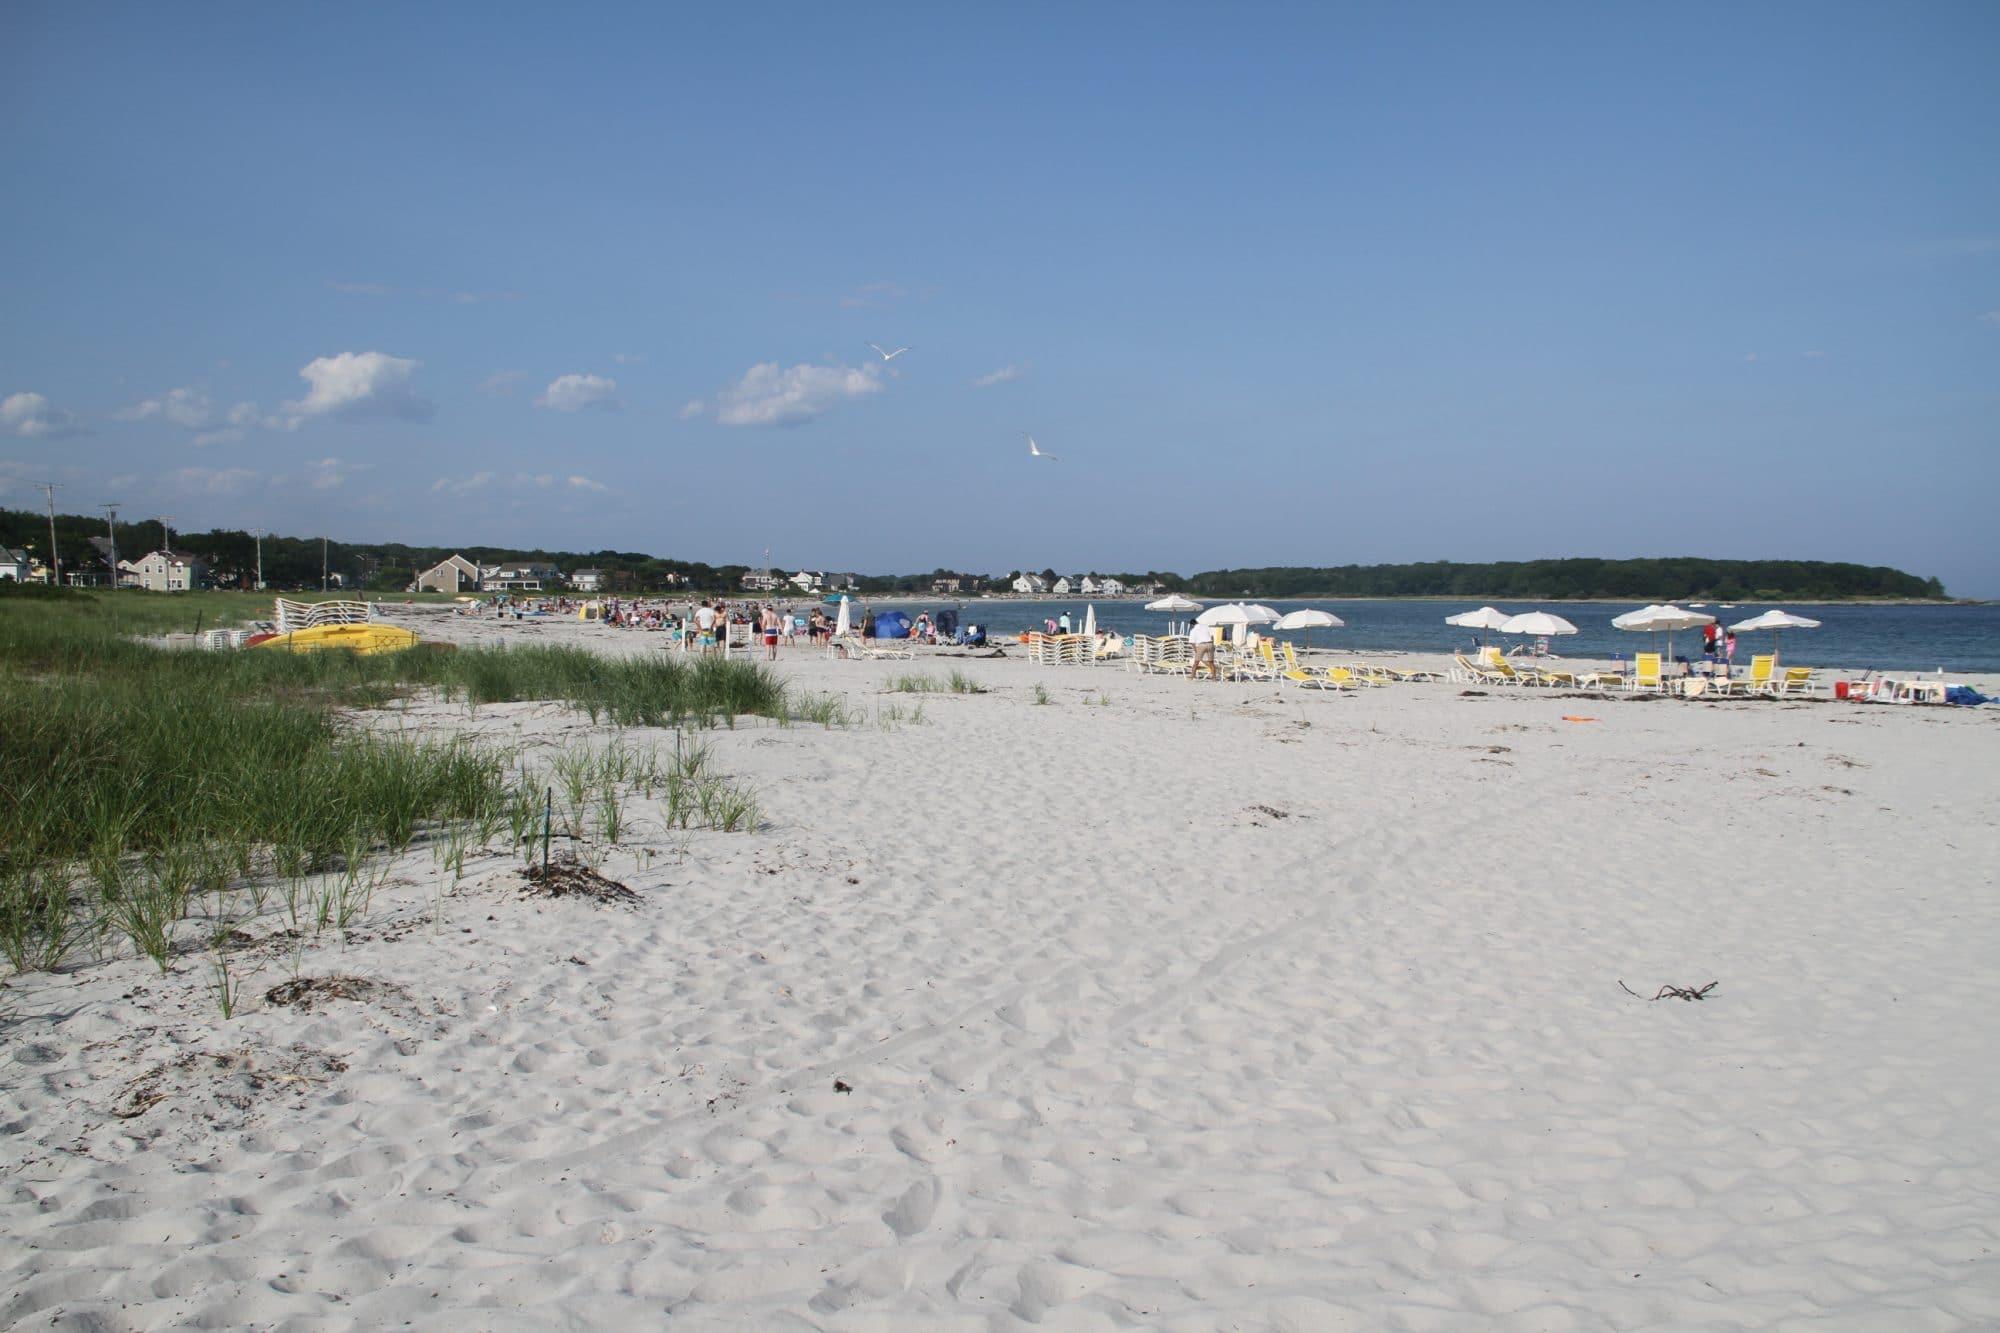 goose-rocks-beach-umbrellas-white